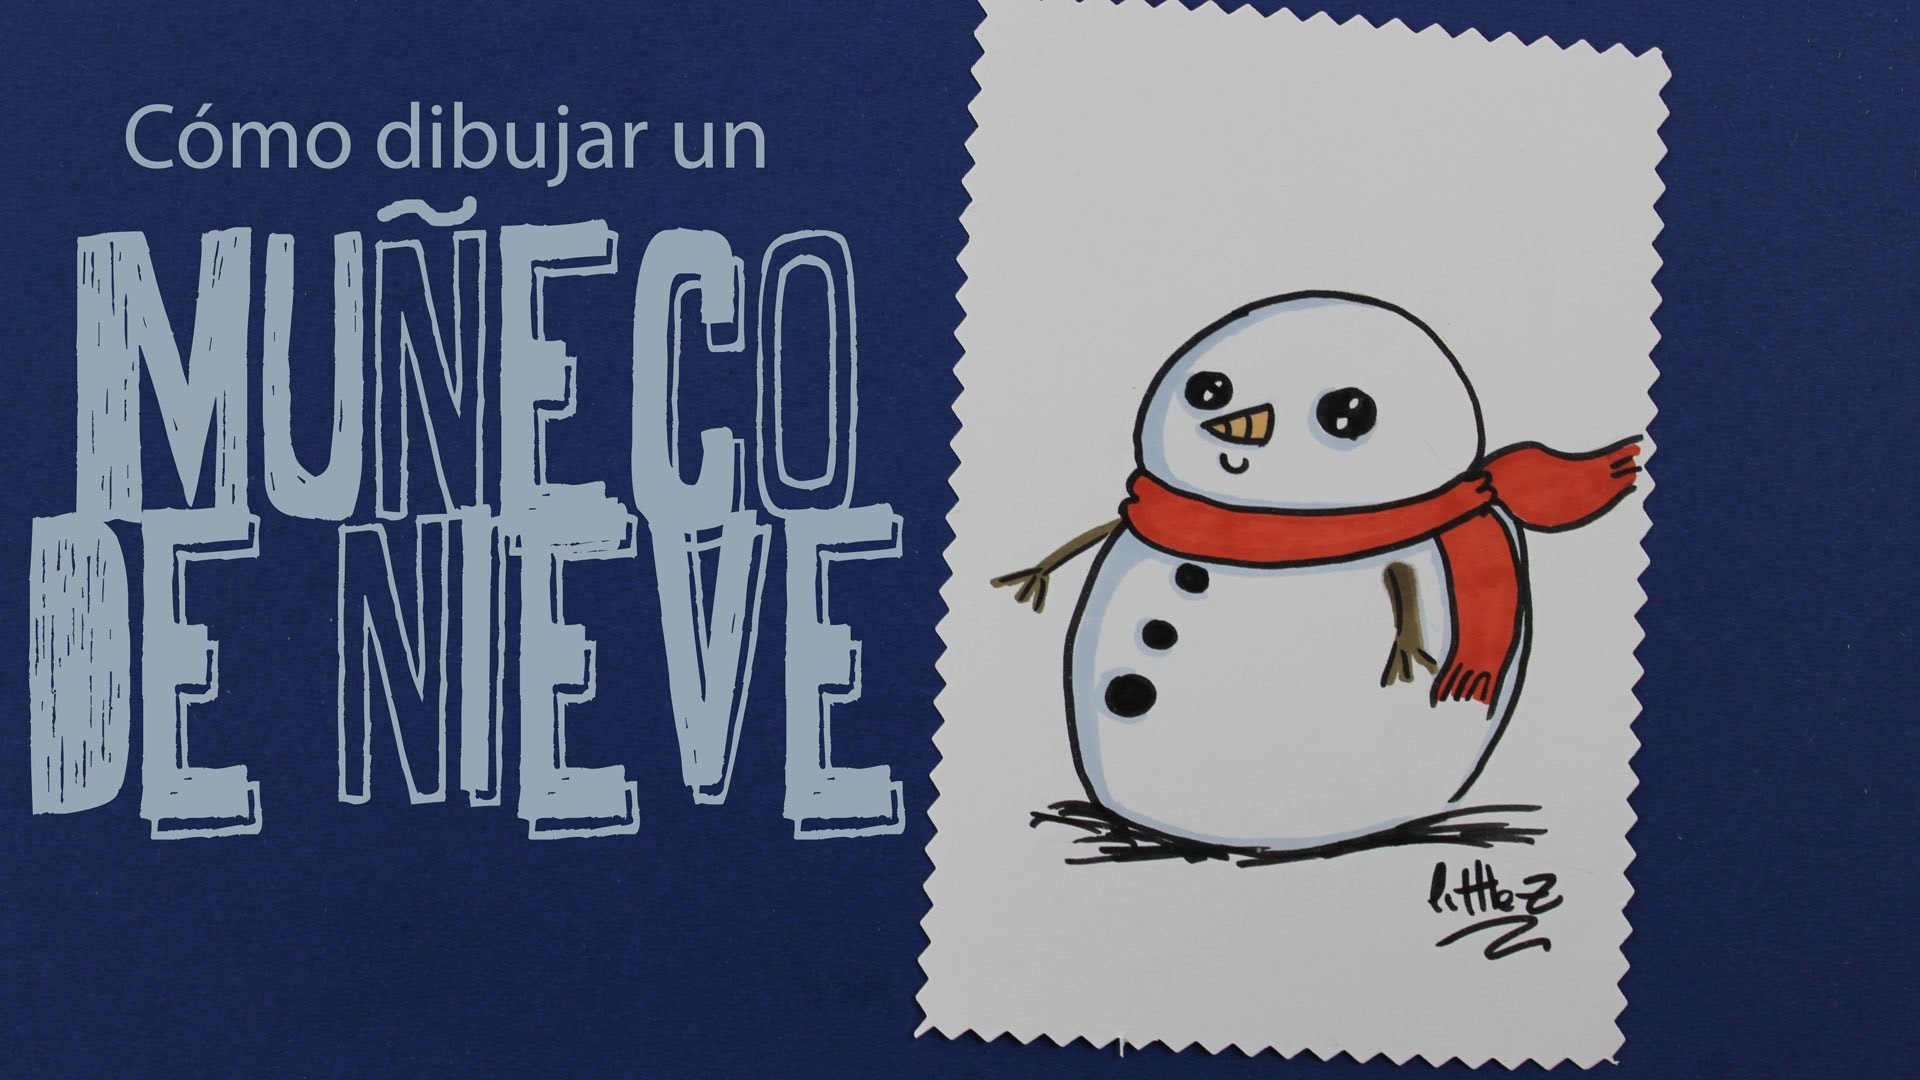 Cómo dibujar un muñeco de nieve. How to draw a snow man